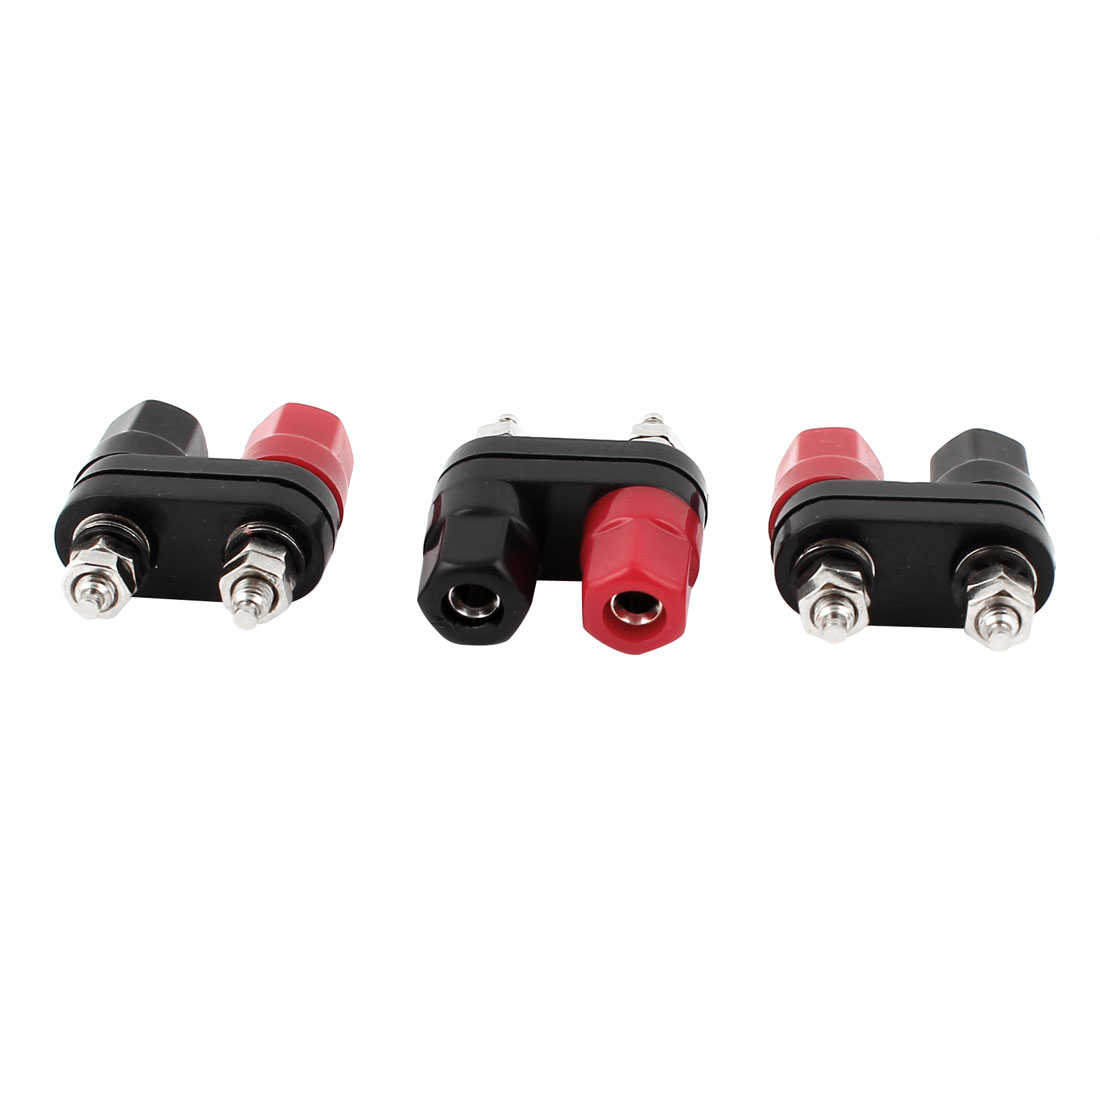 Speaker Amplifier Terminal Binding Post Dual 2-way Banana Adapter Jack 3pcs